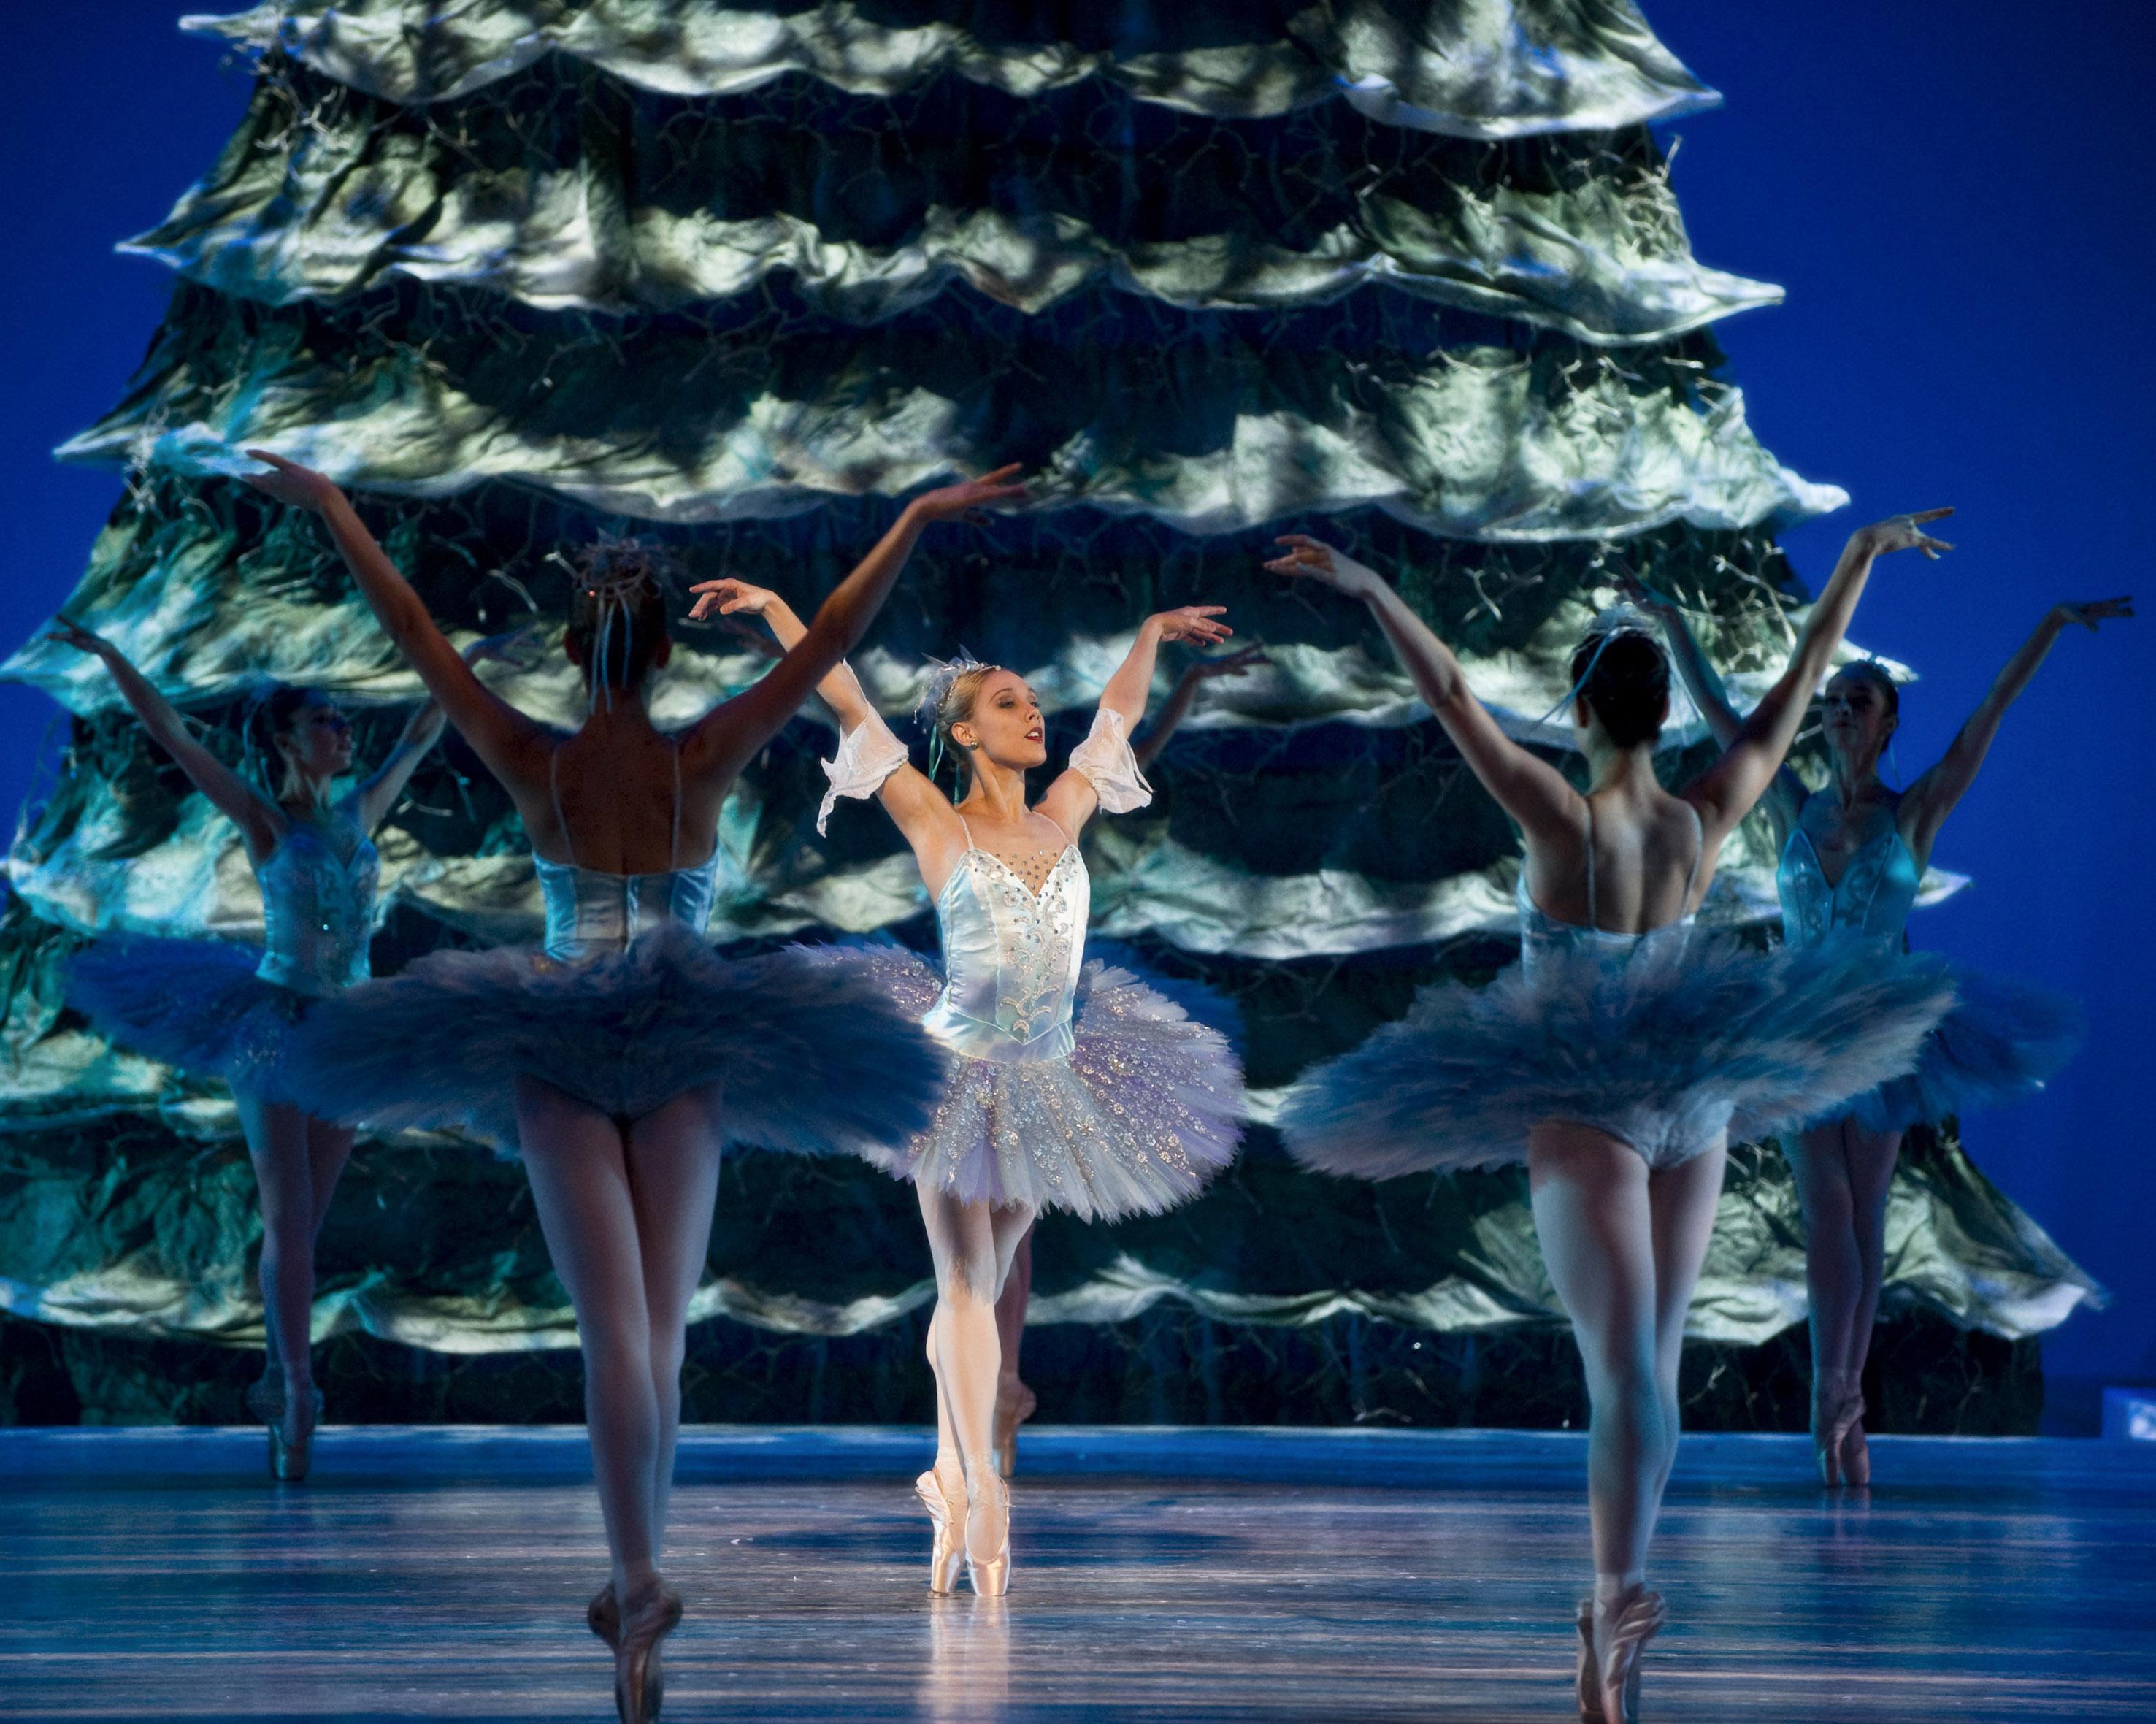 Christmas tree and Nutcracker ballet